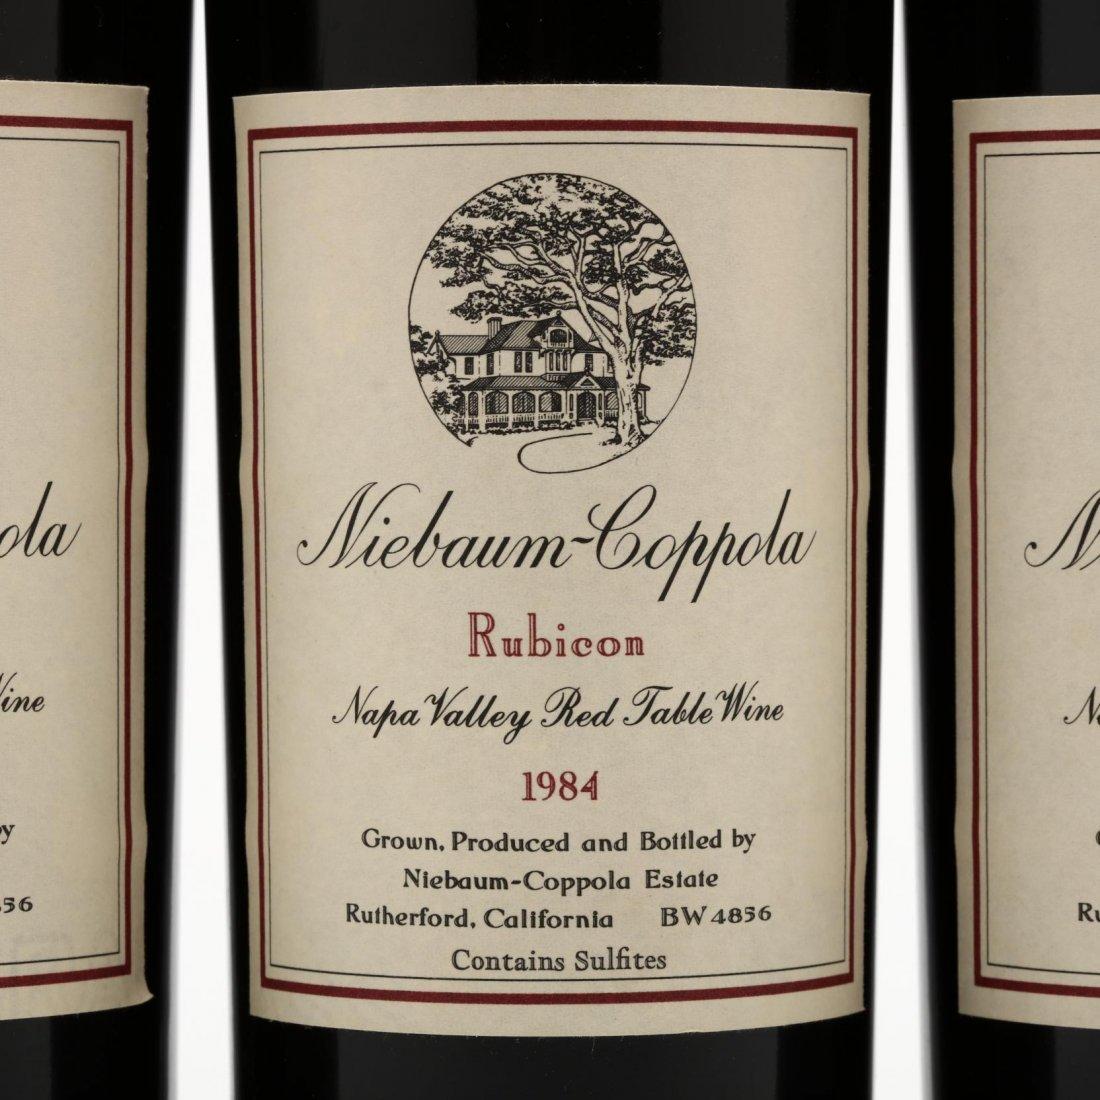 Niebaum-Coppola Winery - Vintage 1984 - 2